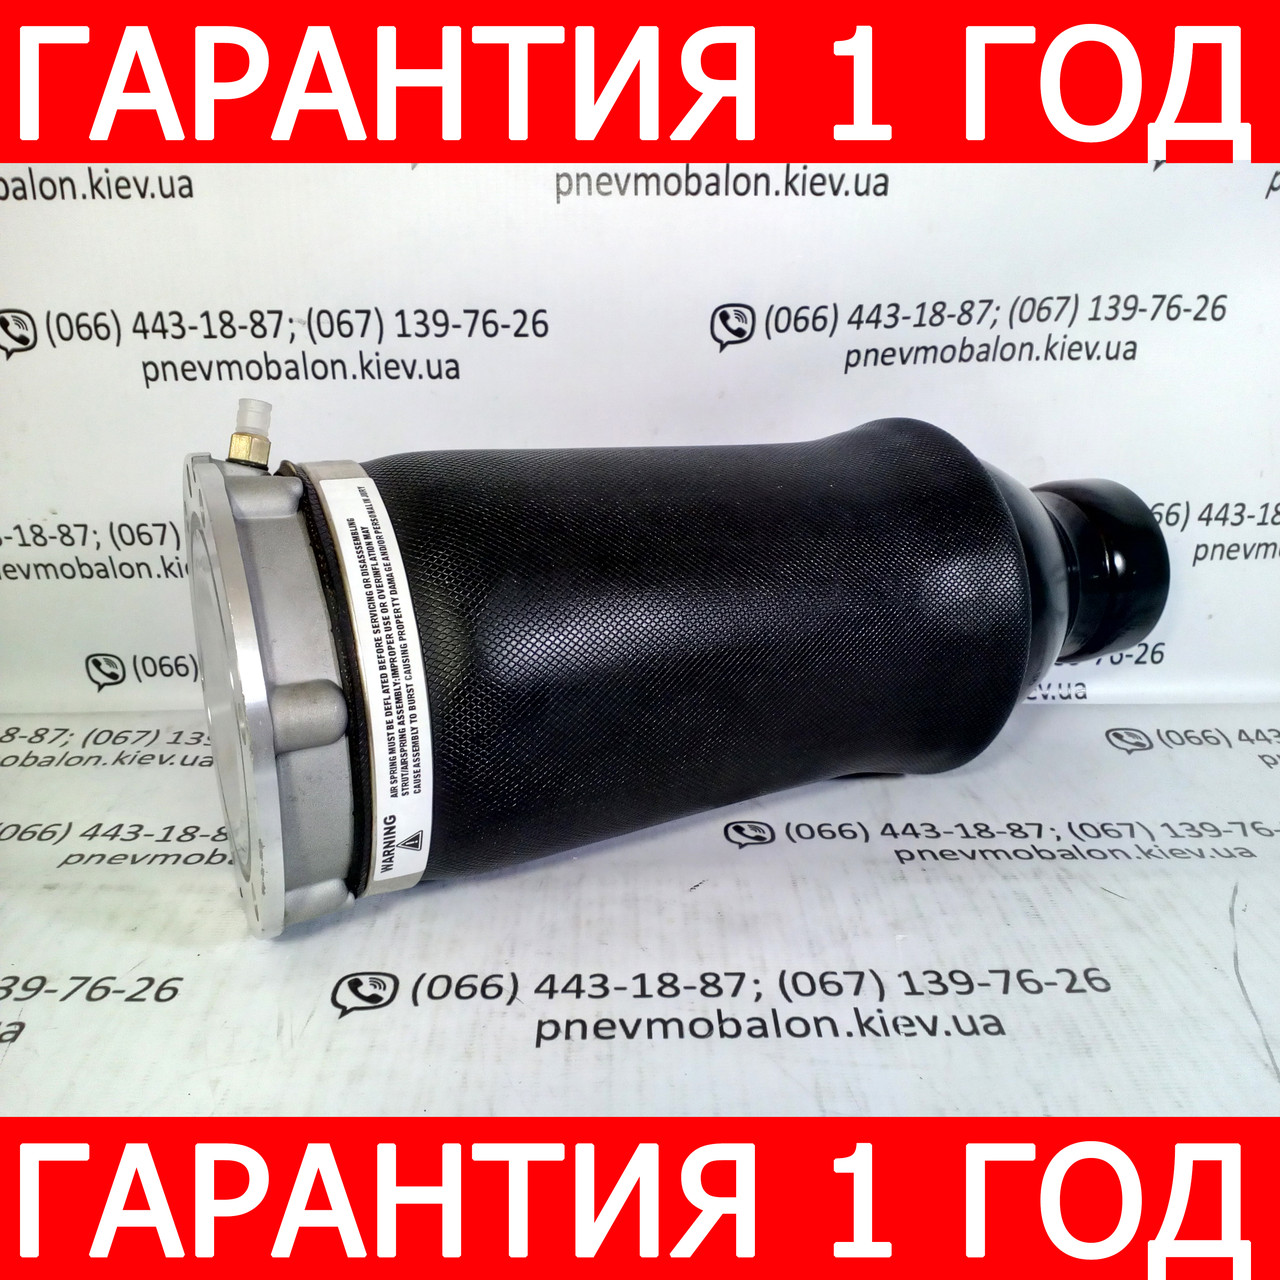 Пневмобаллон передней подвески AUDI A6 (C5)